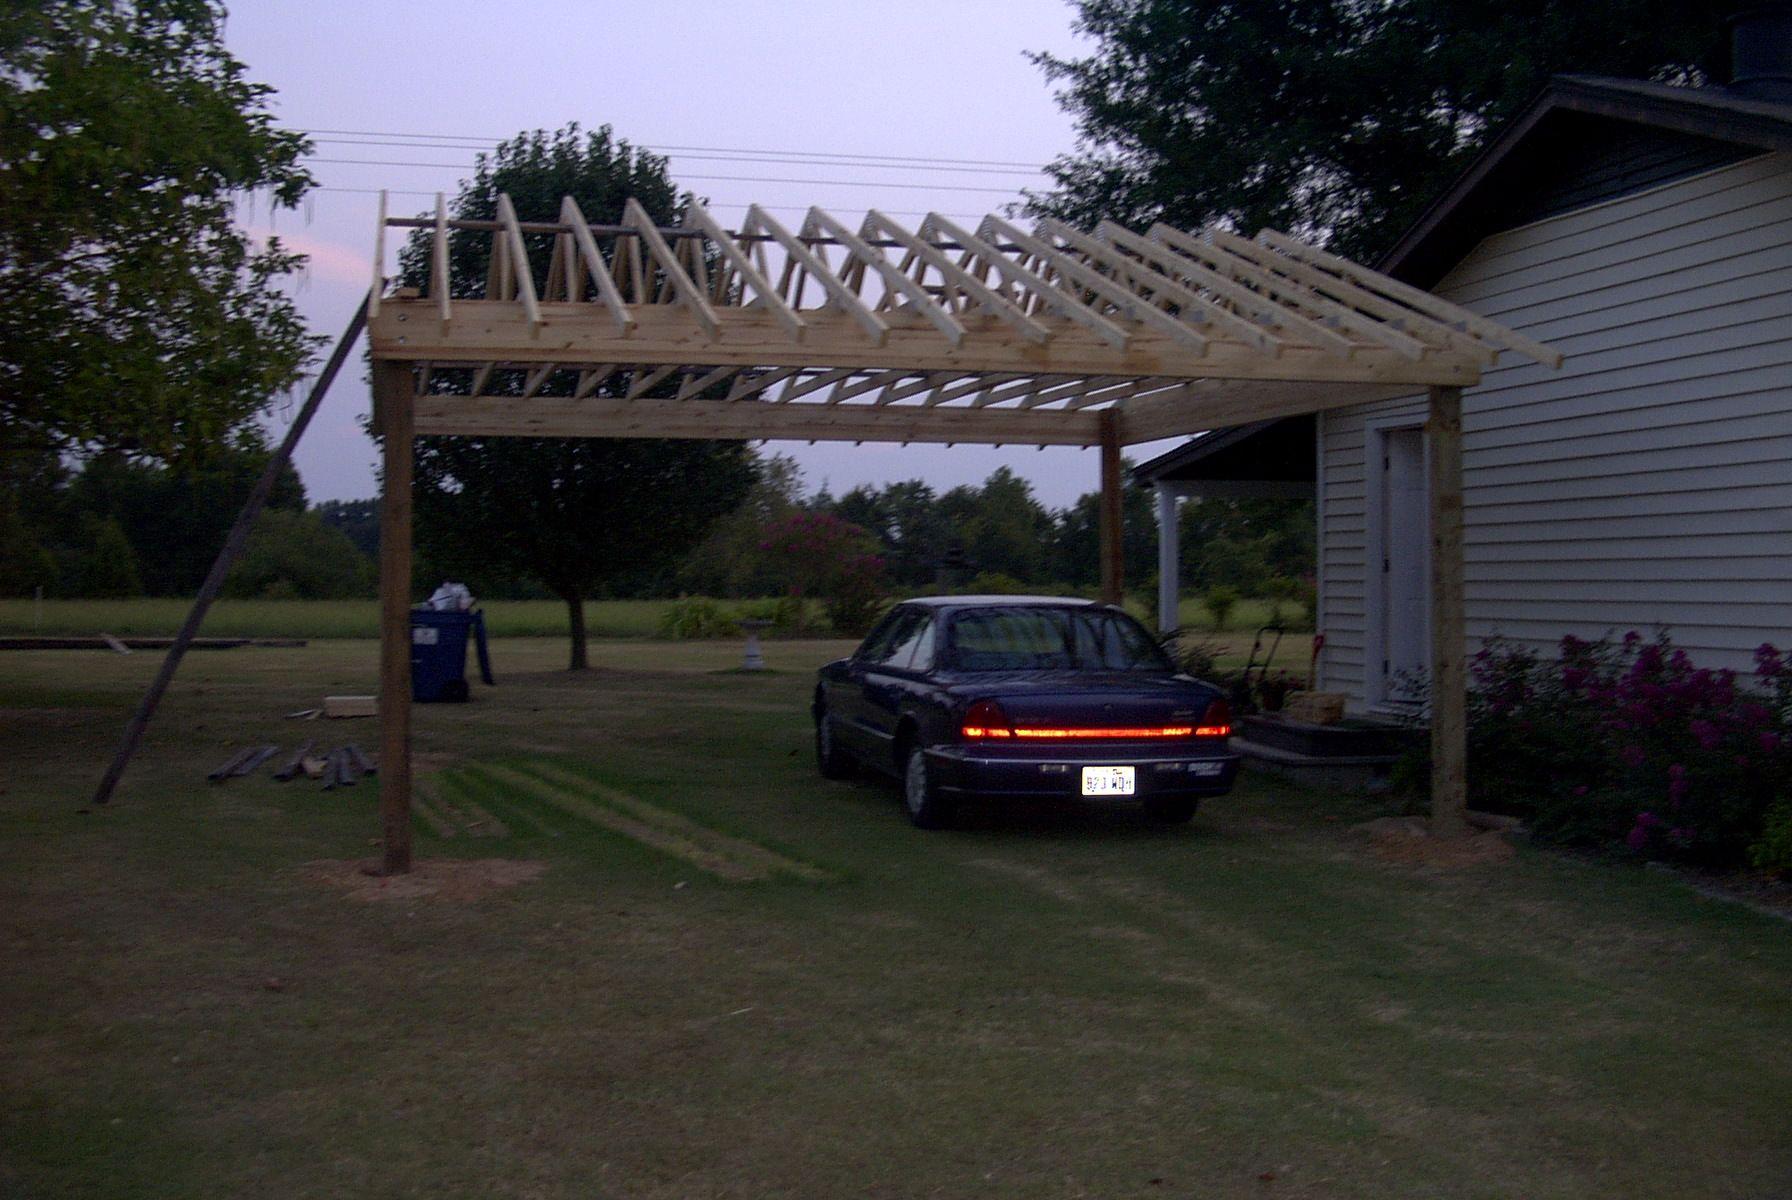 Free Standing Carport 24x24 Ruemoody Free Standing Carport Outdoor Structures Pergola